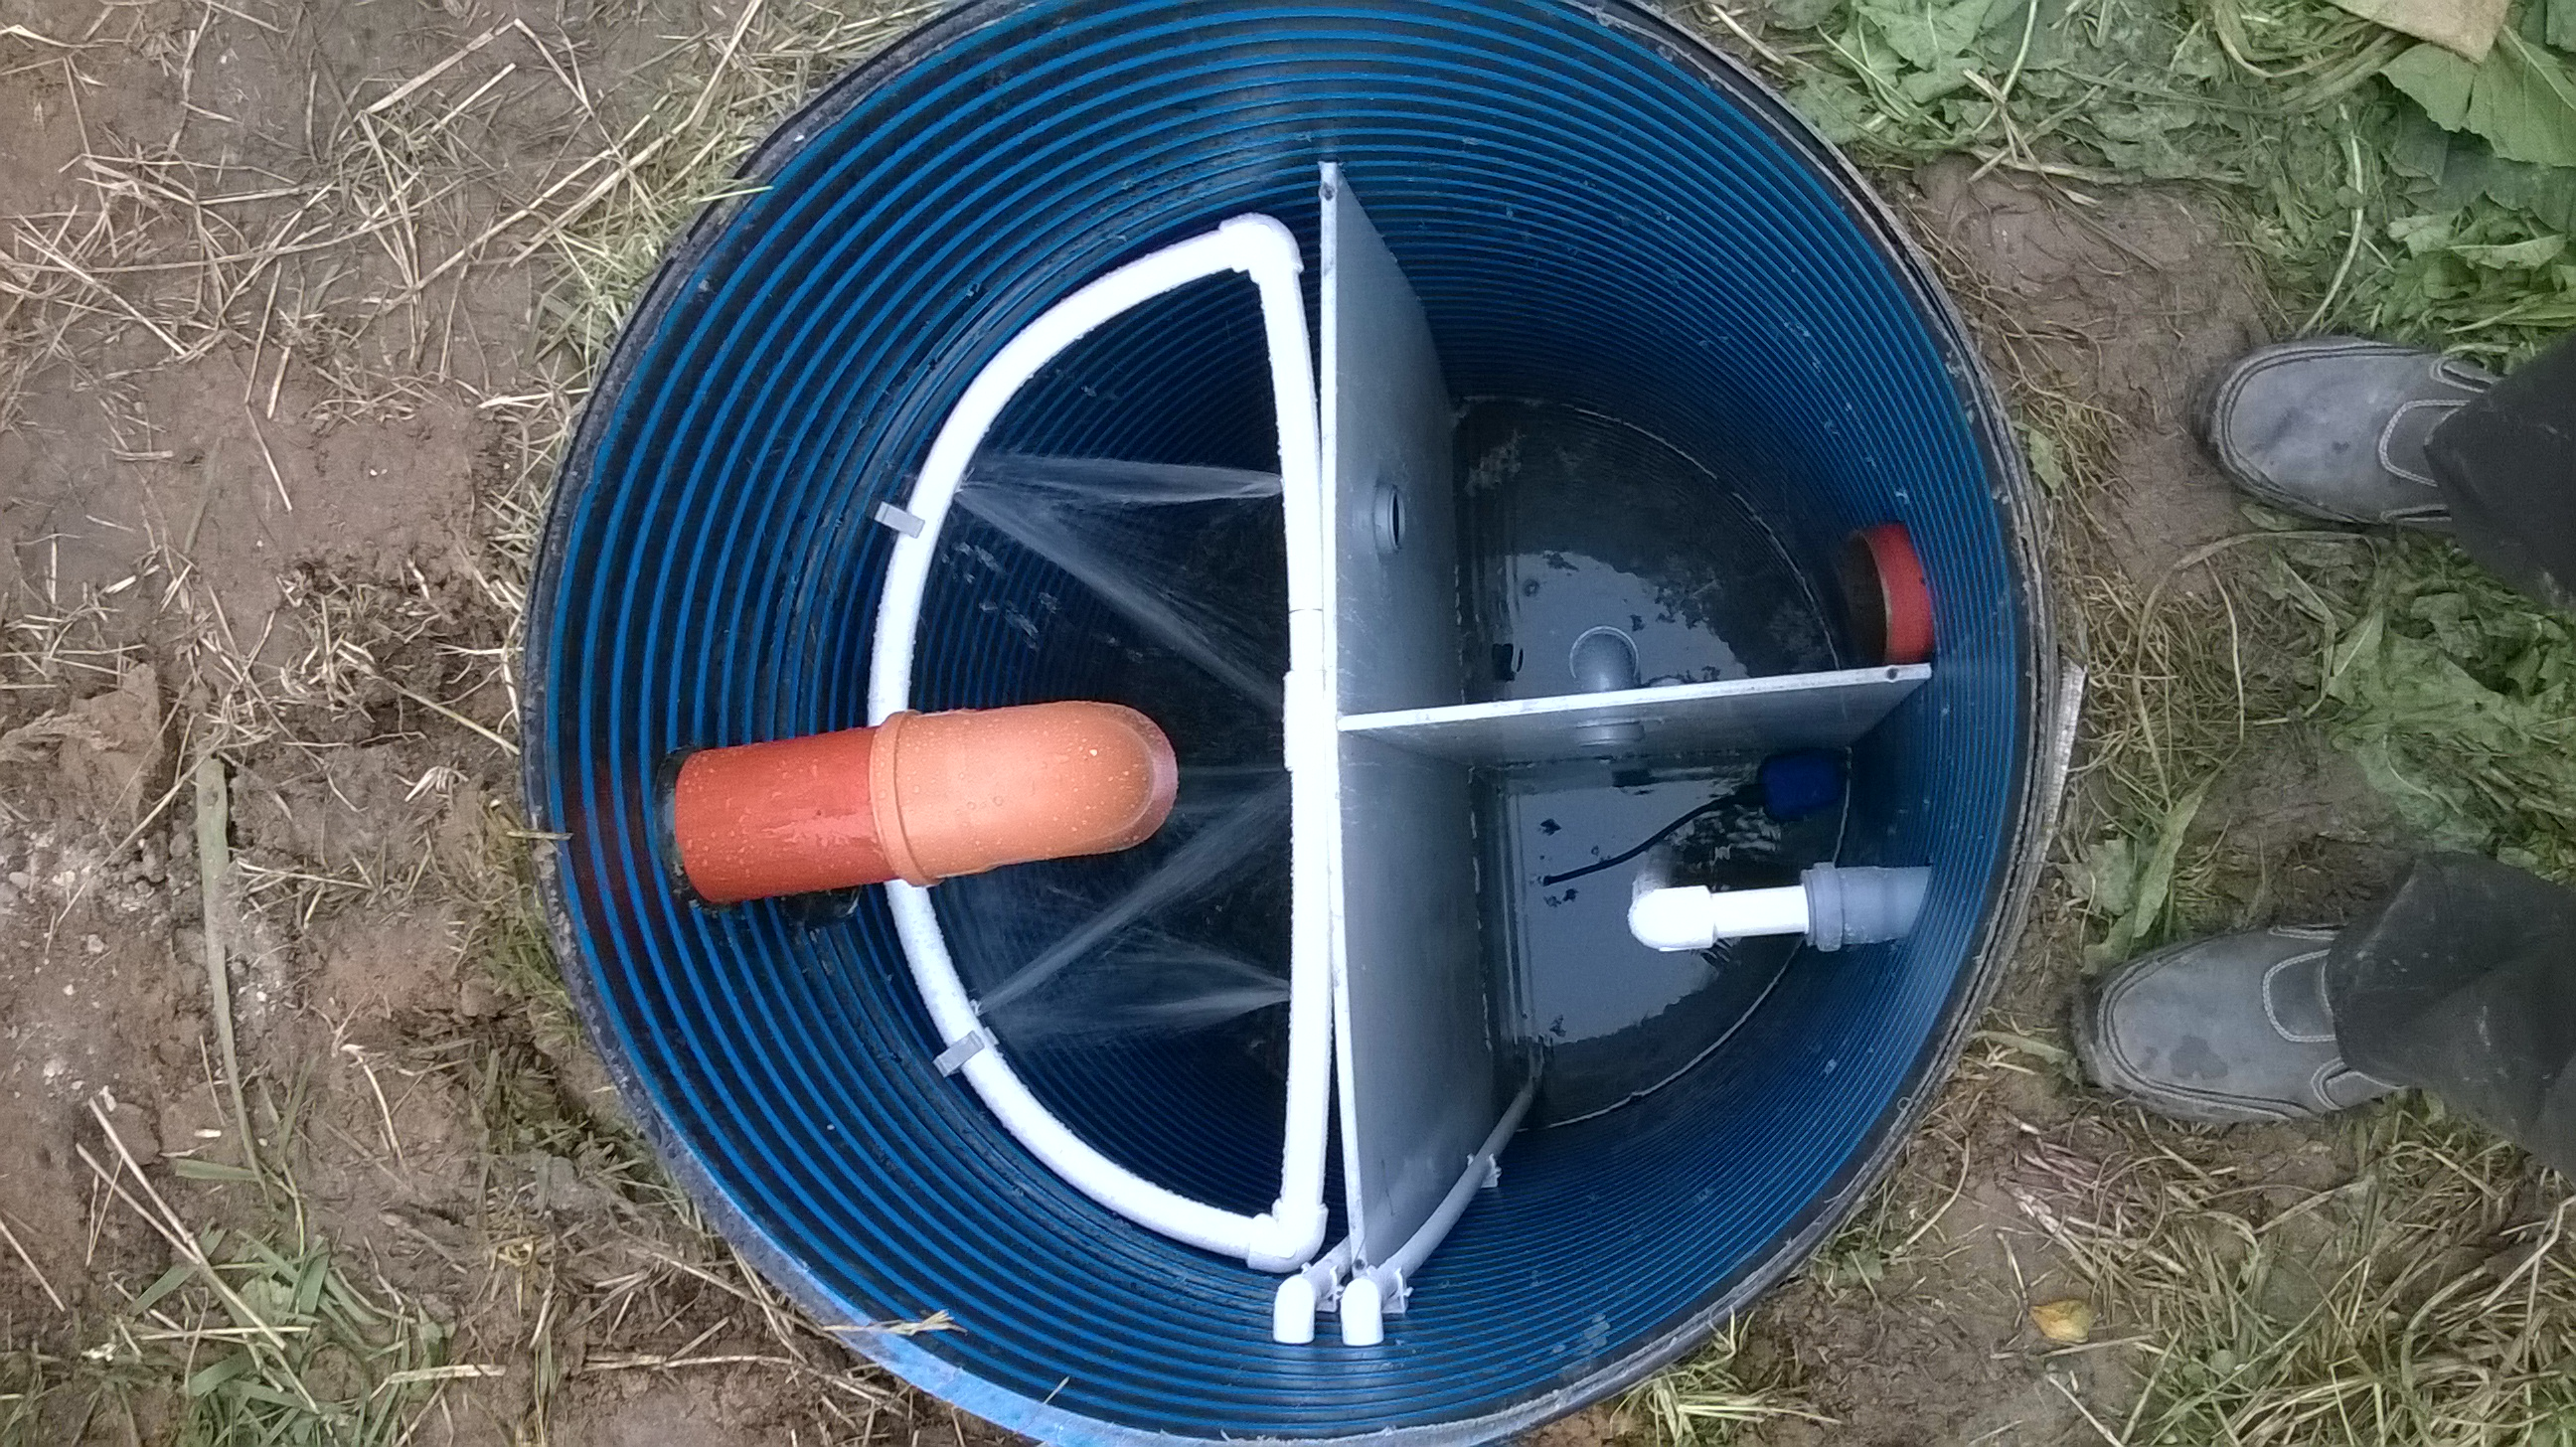 Монтаж канализационных труб - Канализация своими руками 39